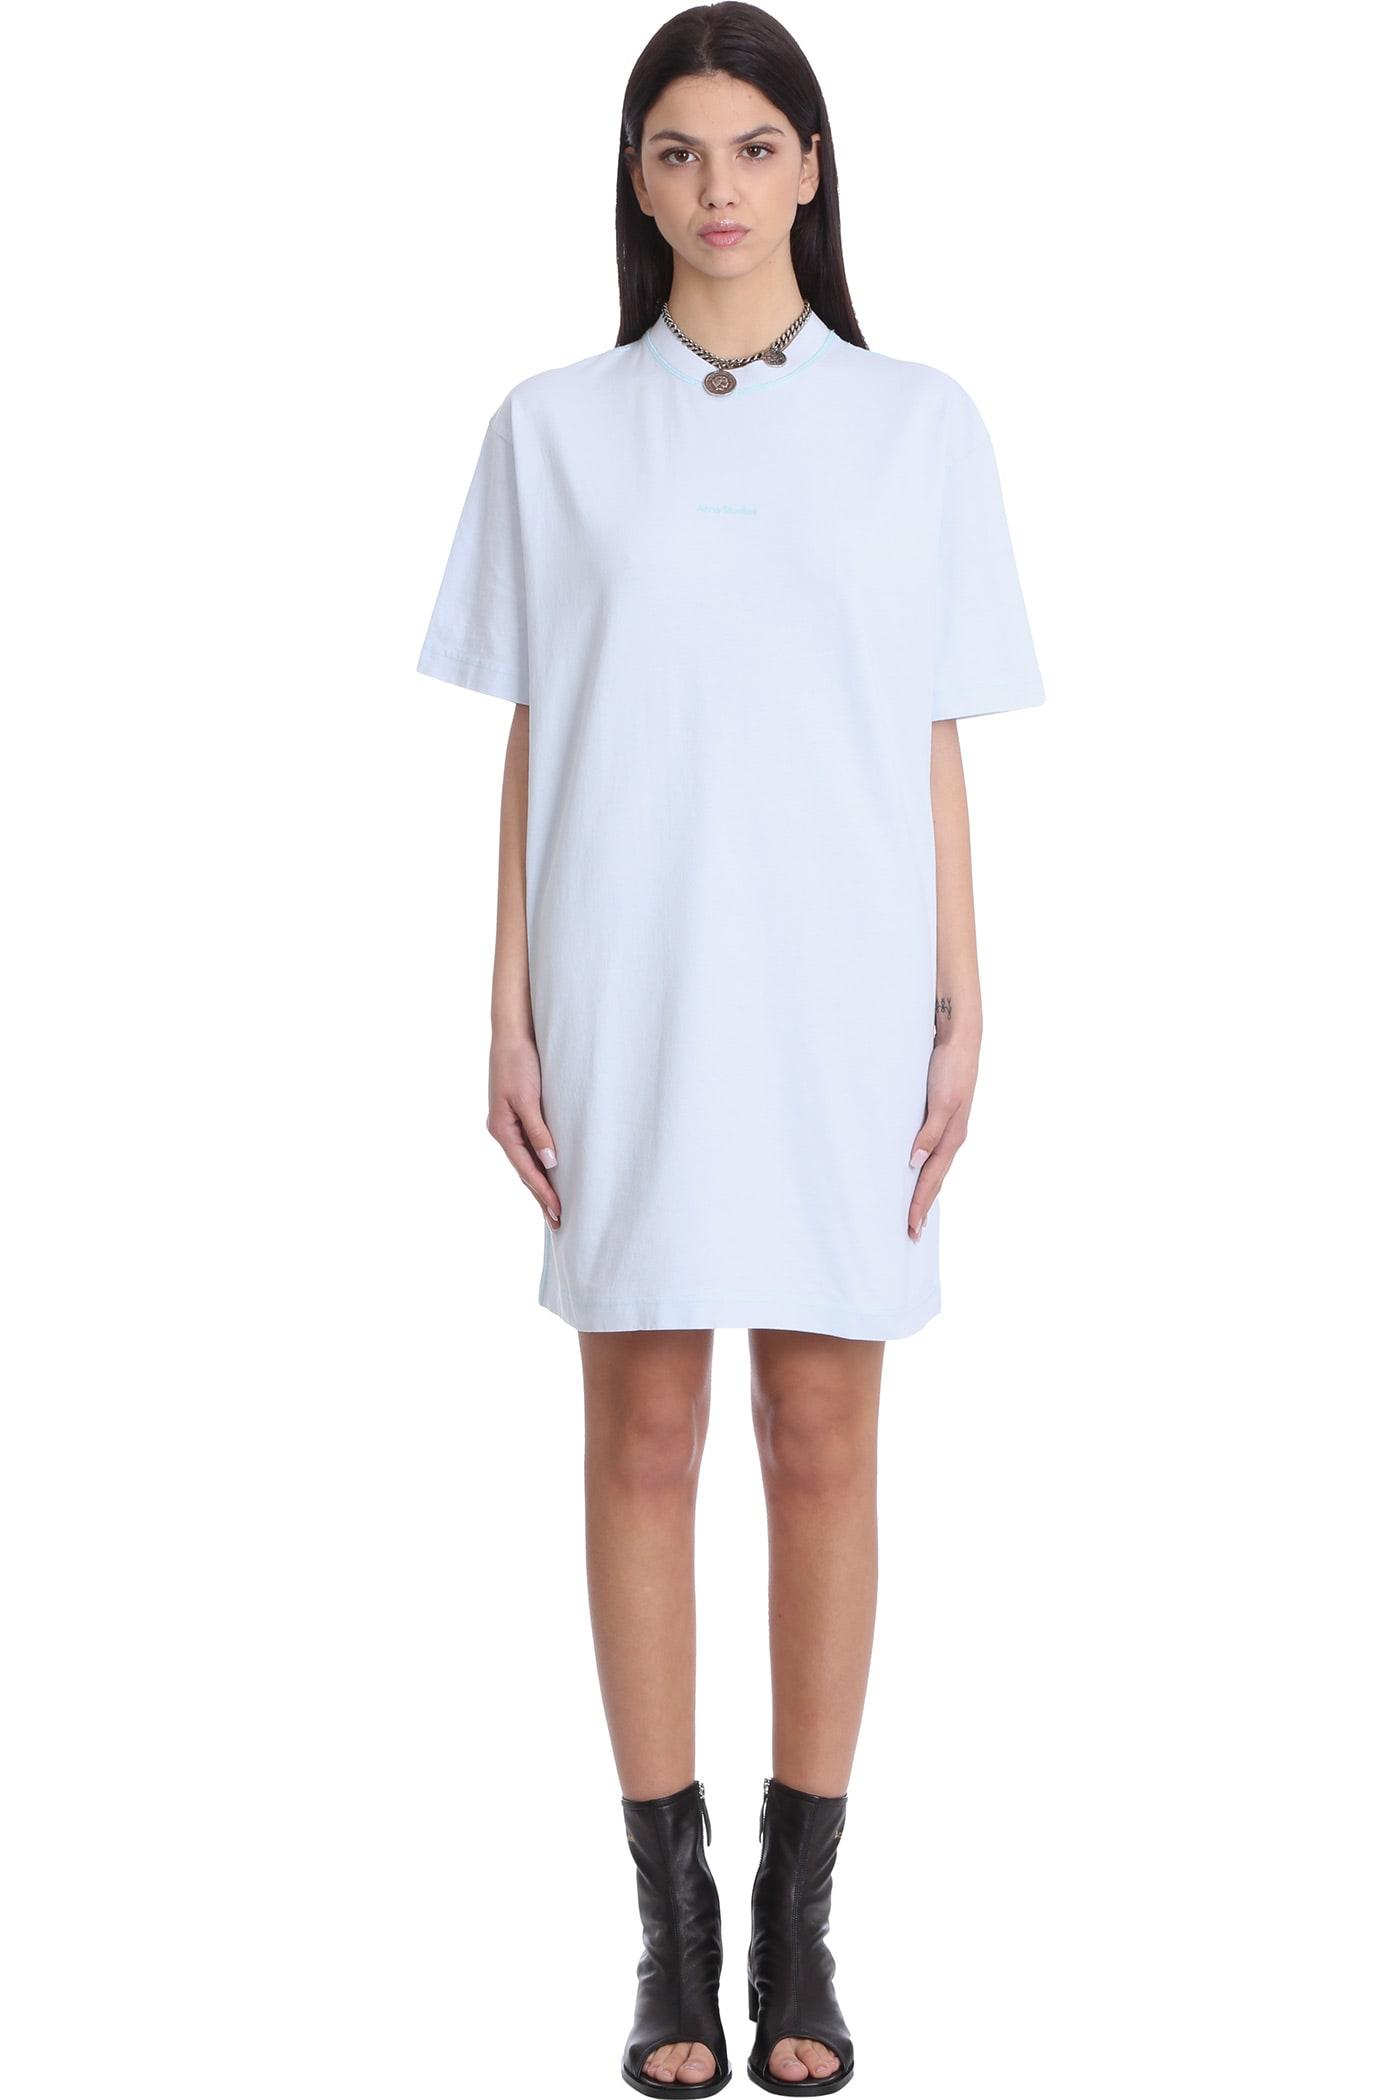 Acne Studios Erin Stamp Dress In Cyan Cotton